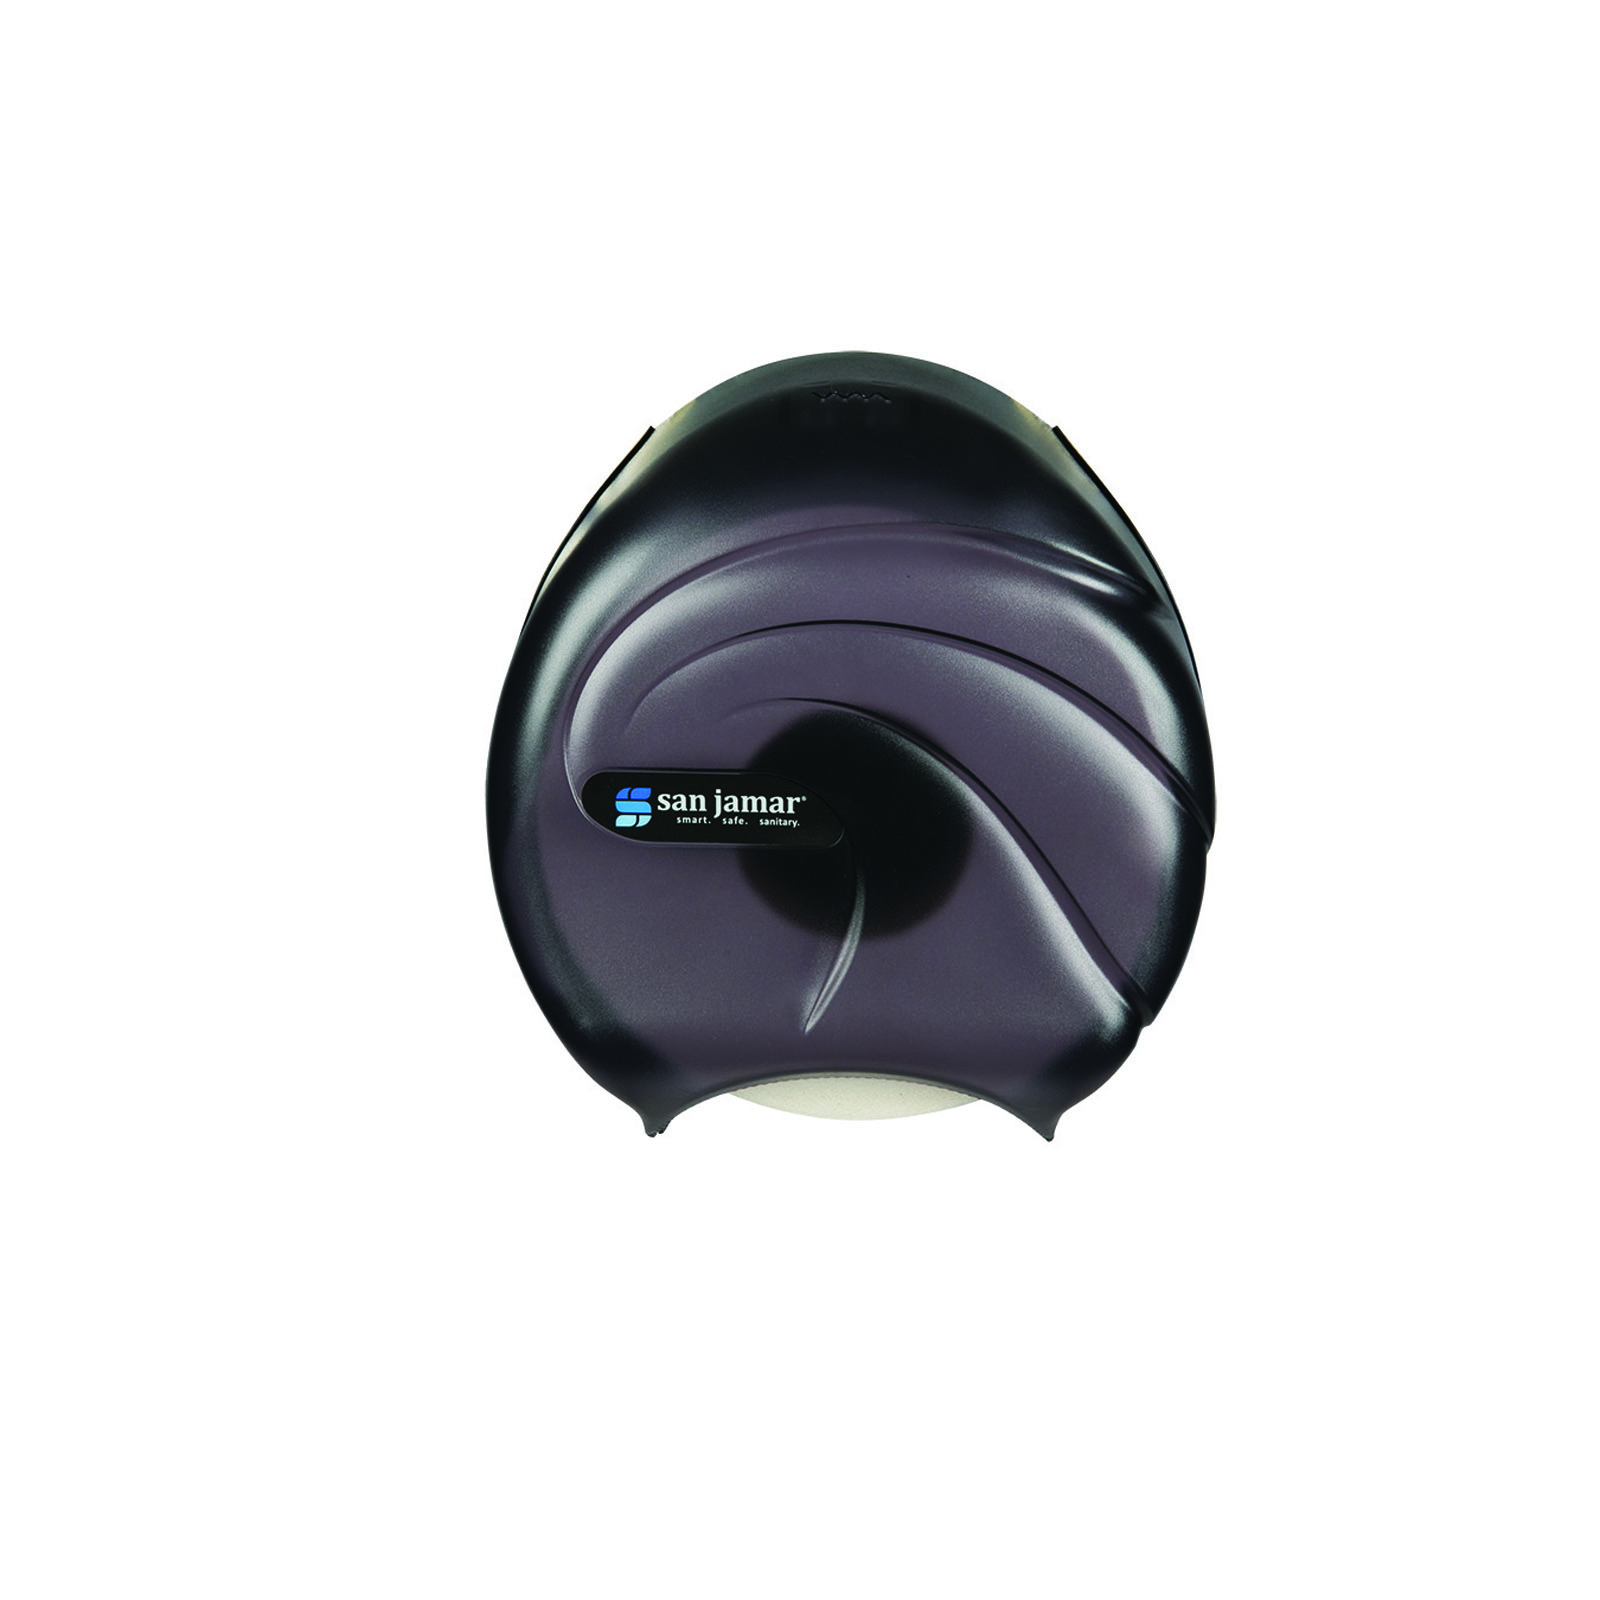 San Jamar R2090TBK toilet tissue dispenser